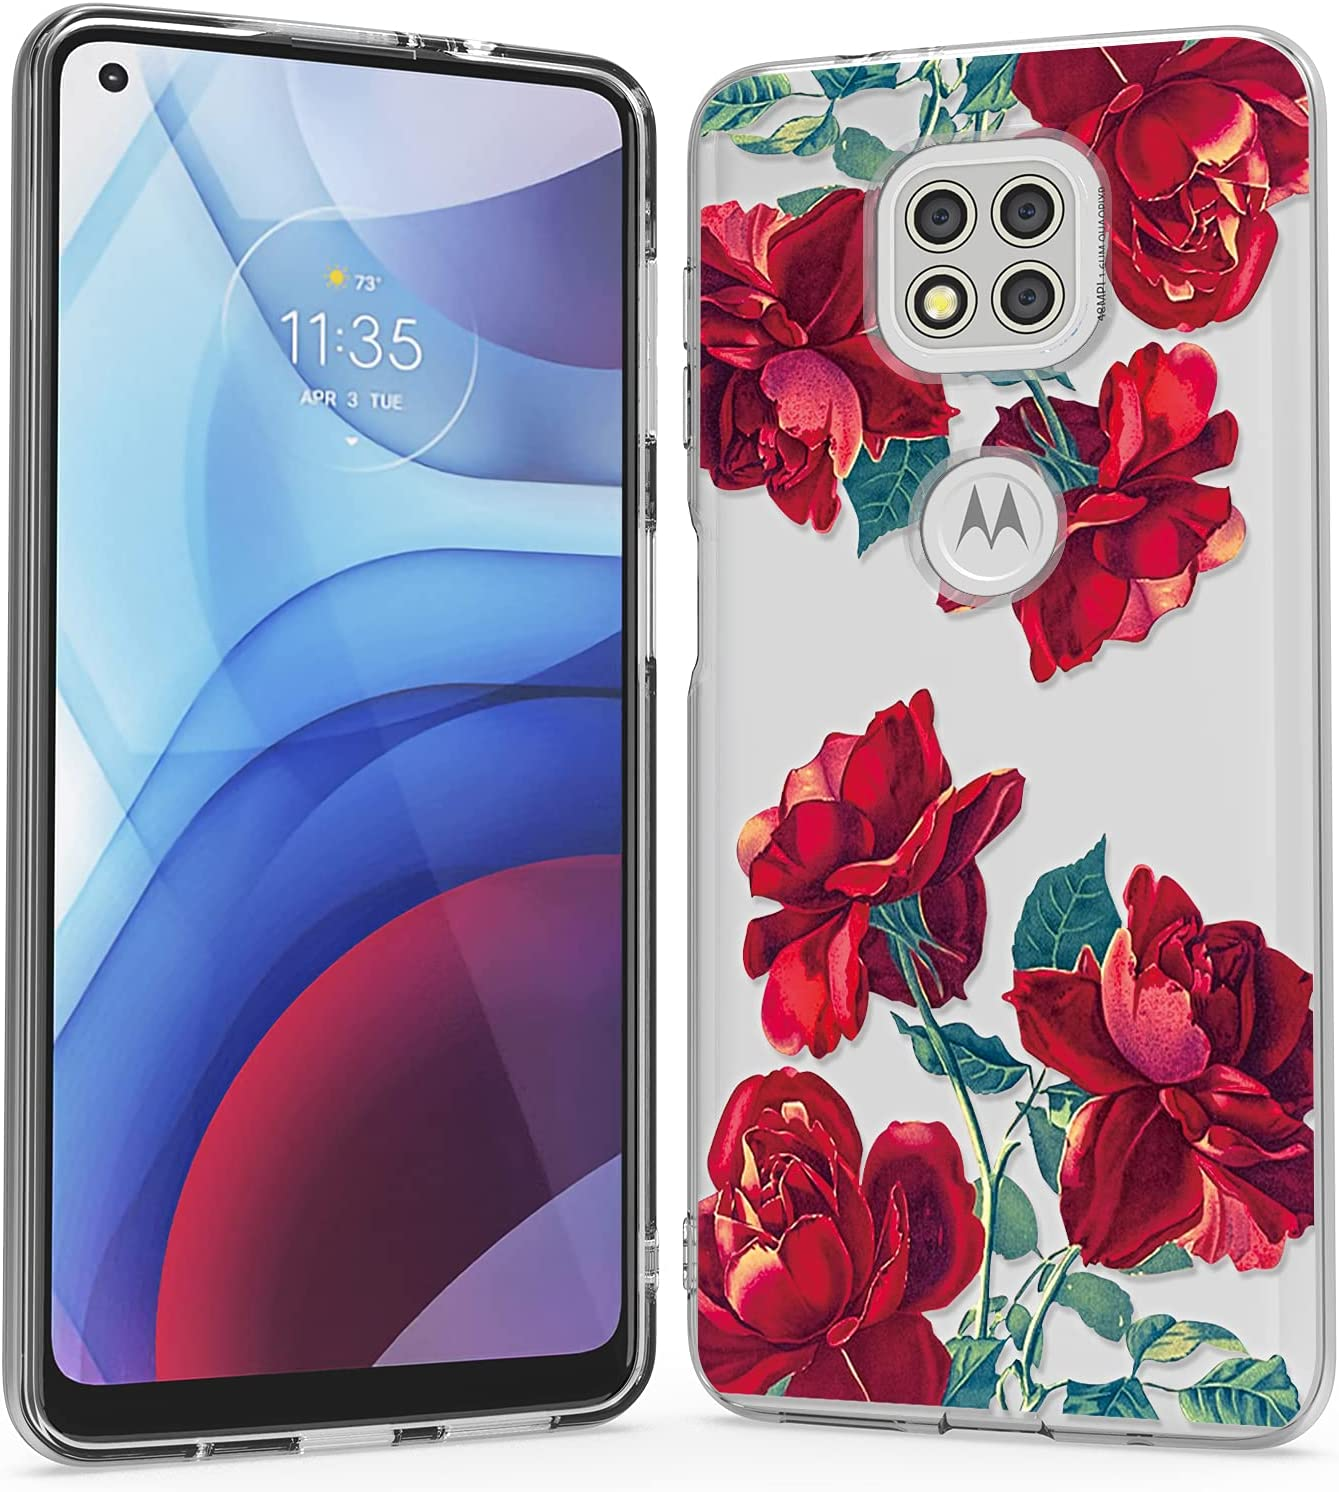 WZOKA for Motorola G Power Case, Slim Soft Phone Case for Moto G Power 2021, Beautiful Classic Basic G Power (2021) Phone Case for Men Women (Rose Red)